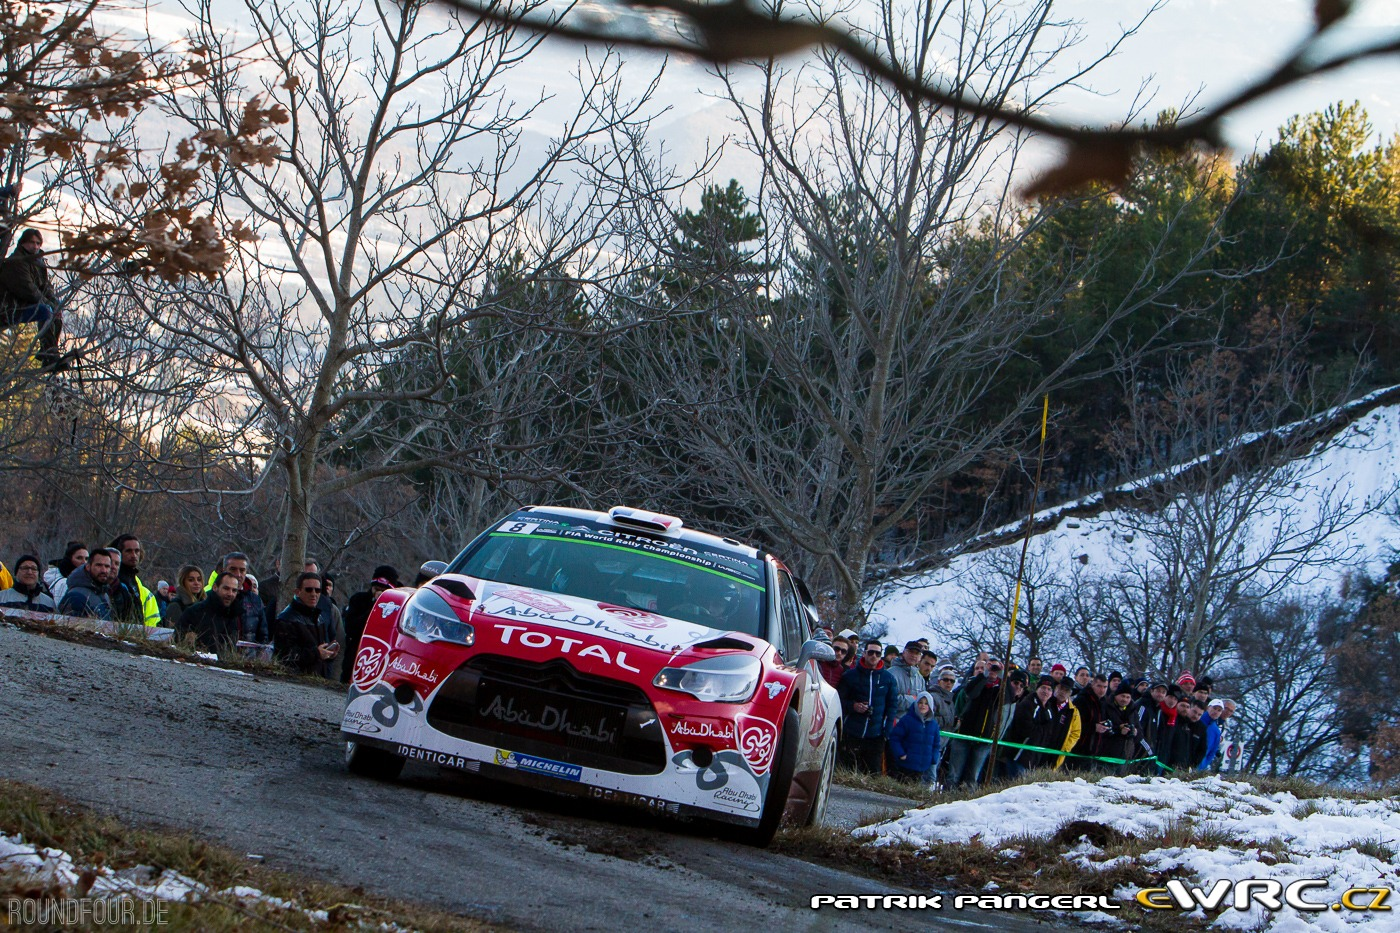 pgr_wrc-rally-monte-carlo-2016-006-steph